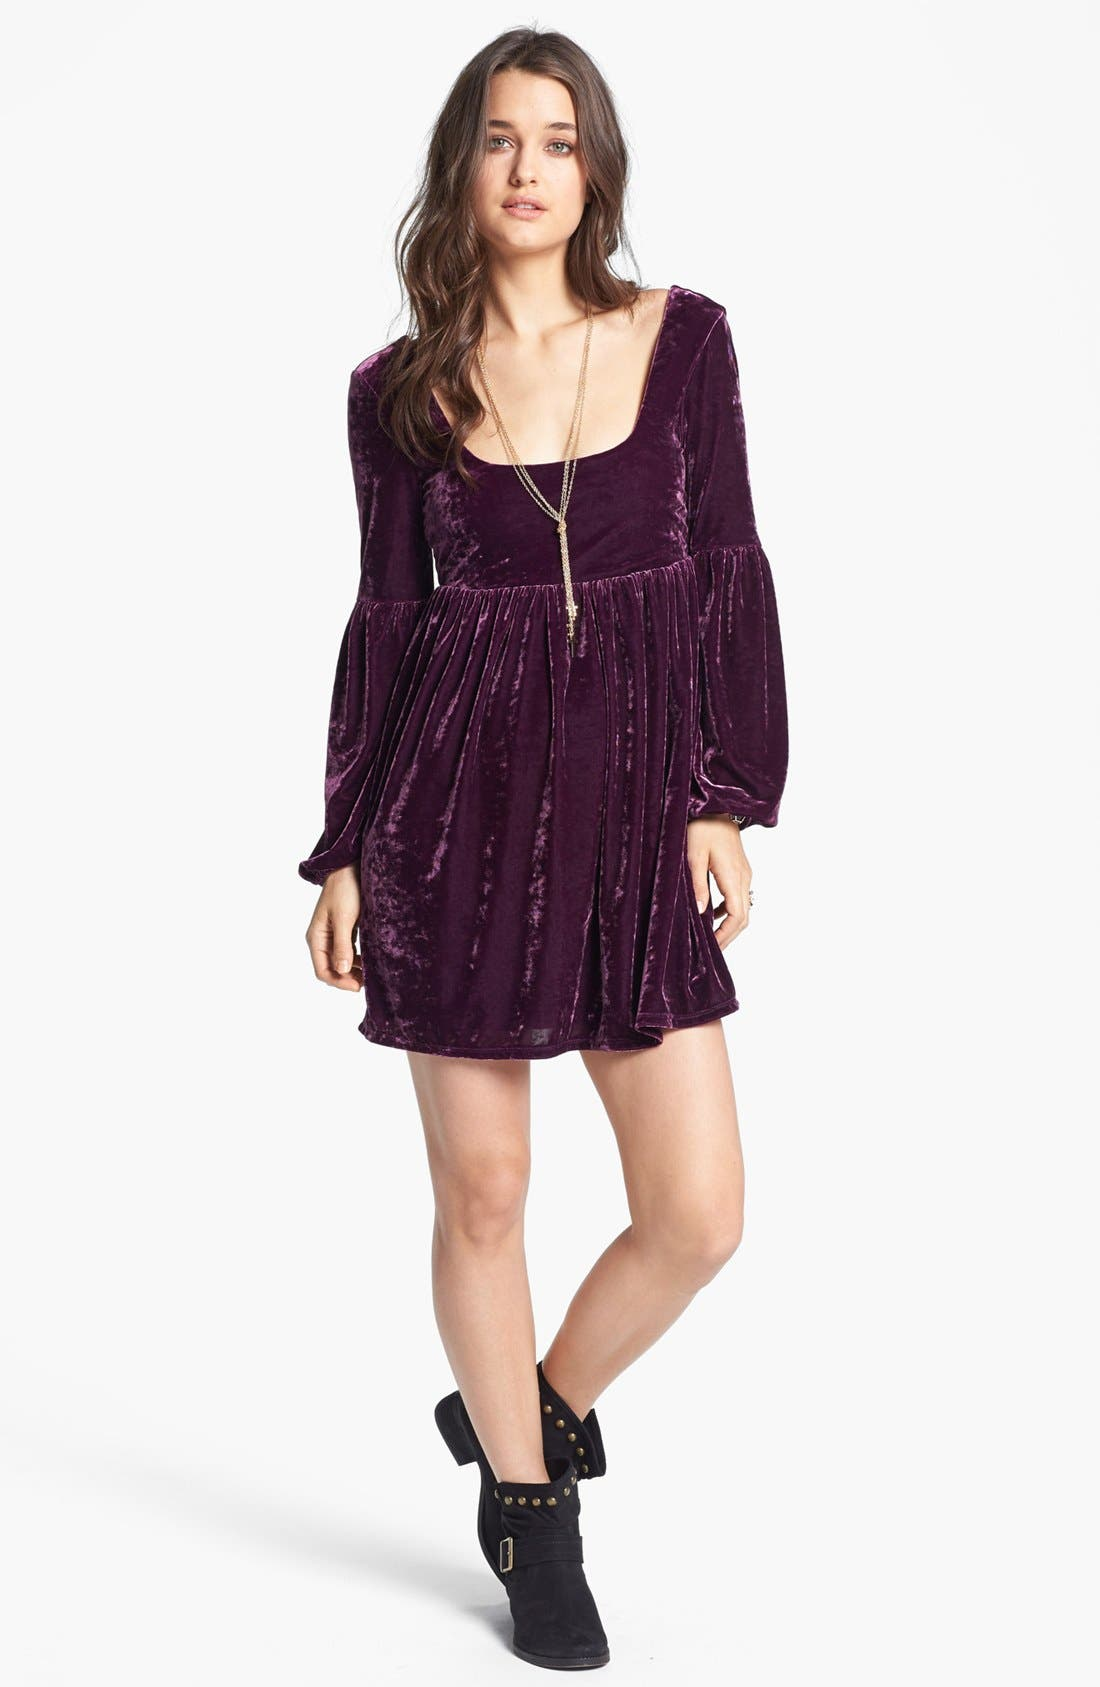 Main Image - Free People 'Oh So Easy' Velvet Babydoll Dress